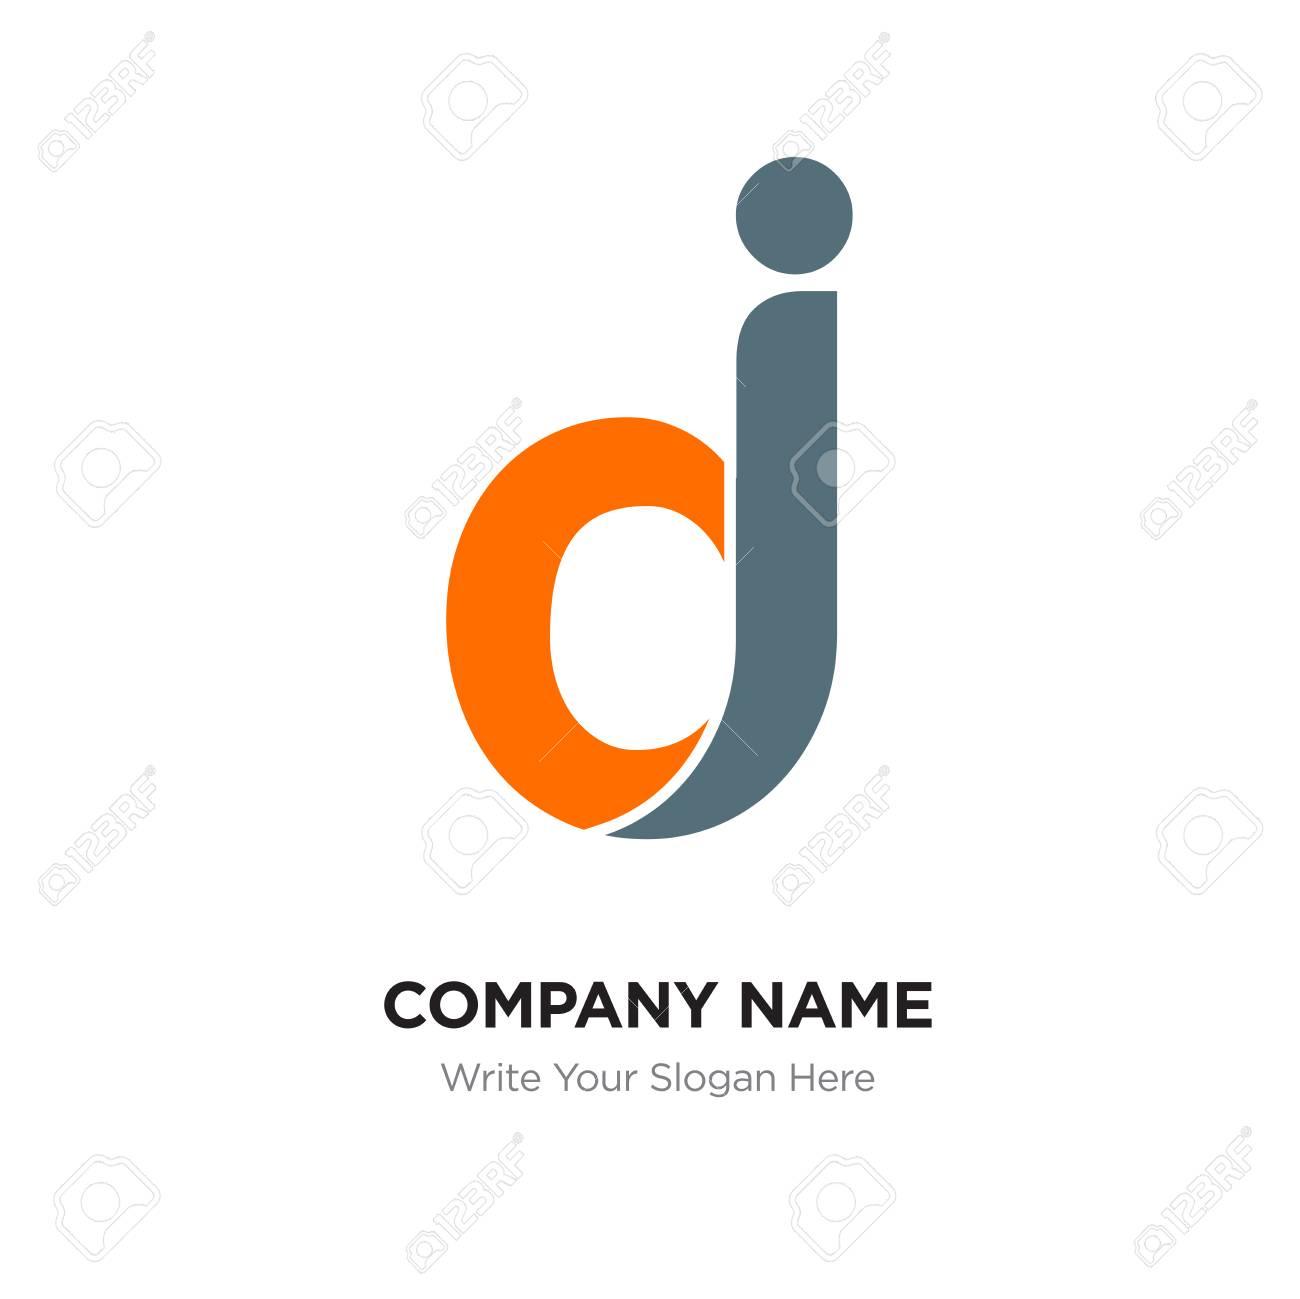 Abstract letter dj logo design template, black and orange Alphabet